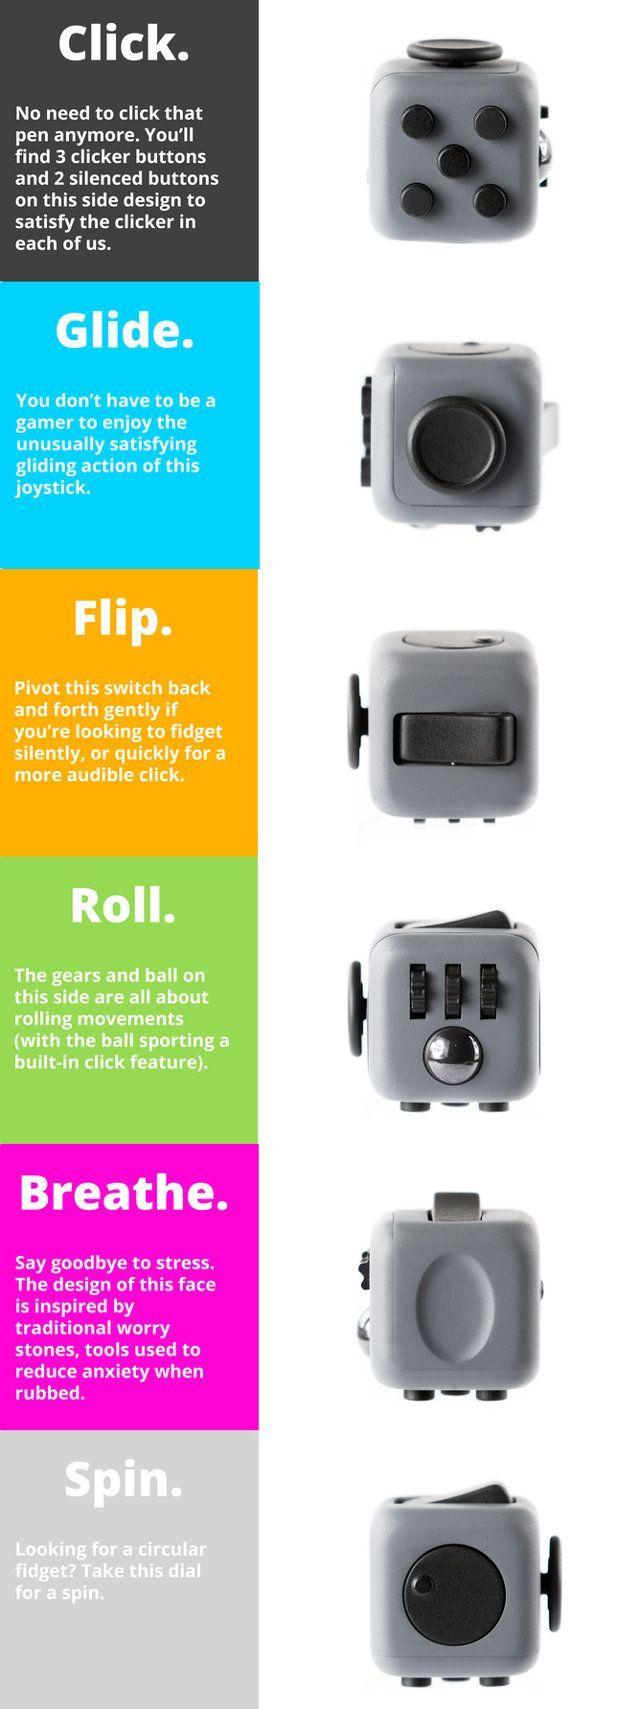 Meet the Fidget Cube, a six-sided vinyl toy designed to help fidgeters manifest…